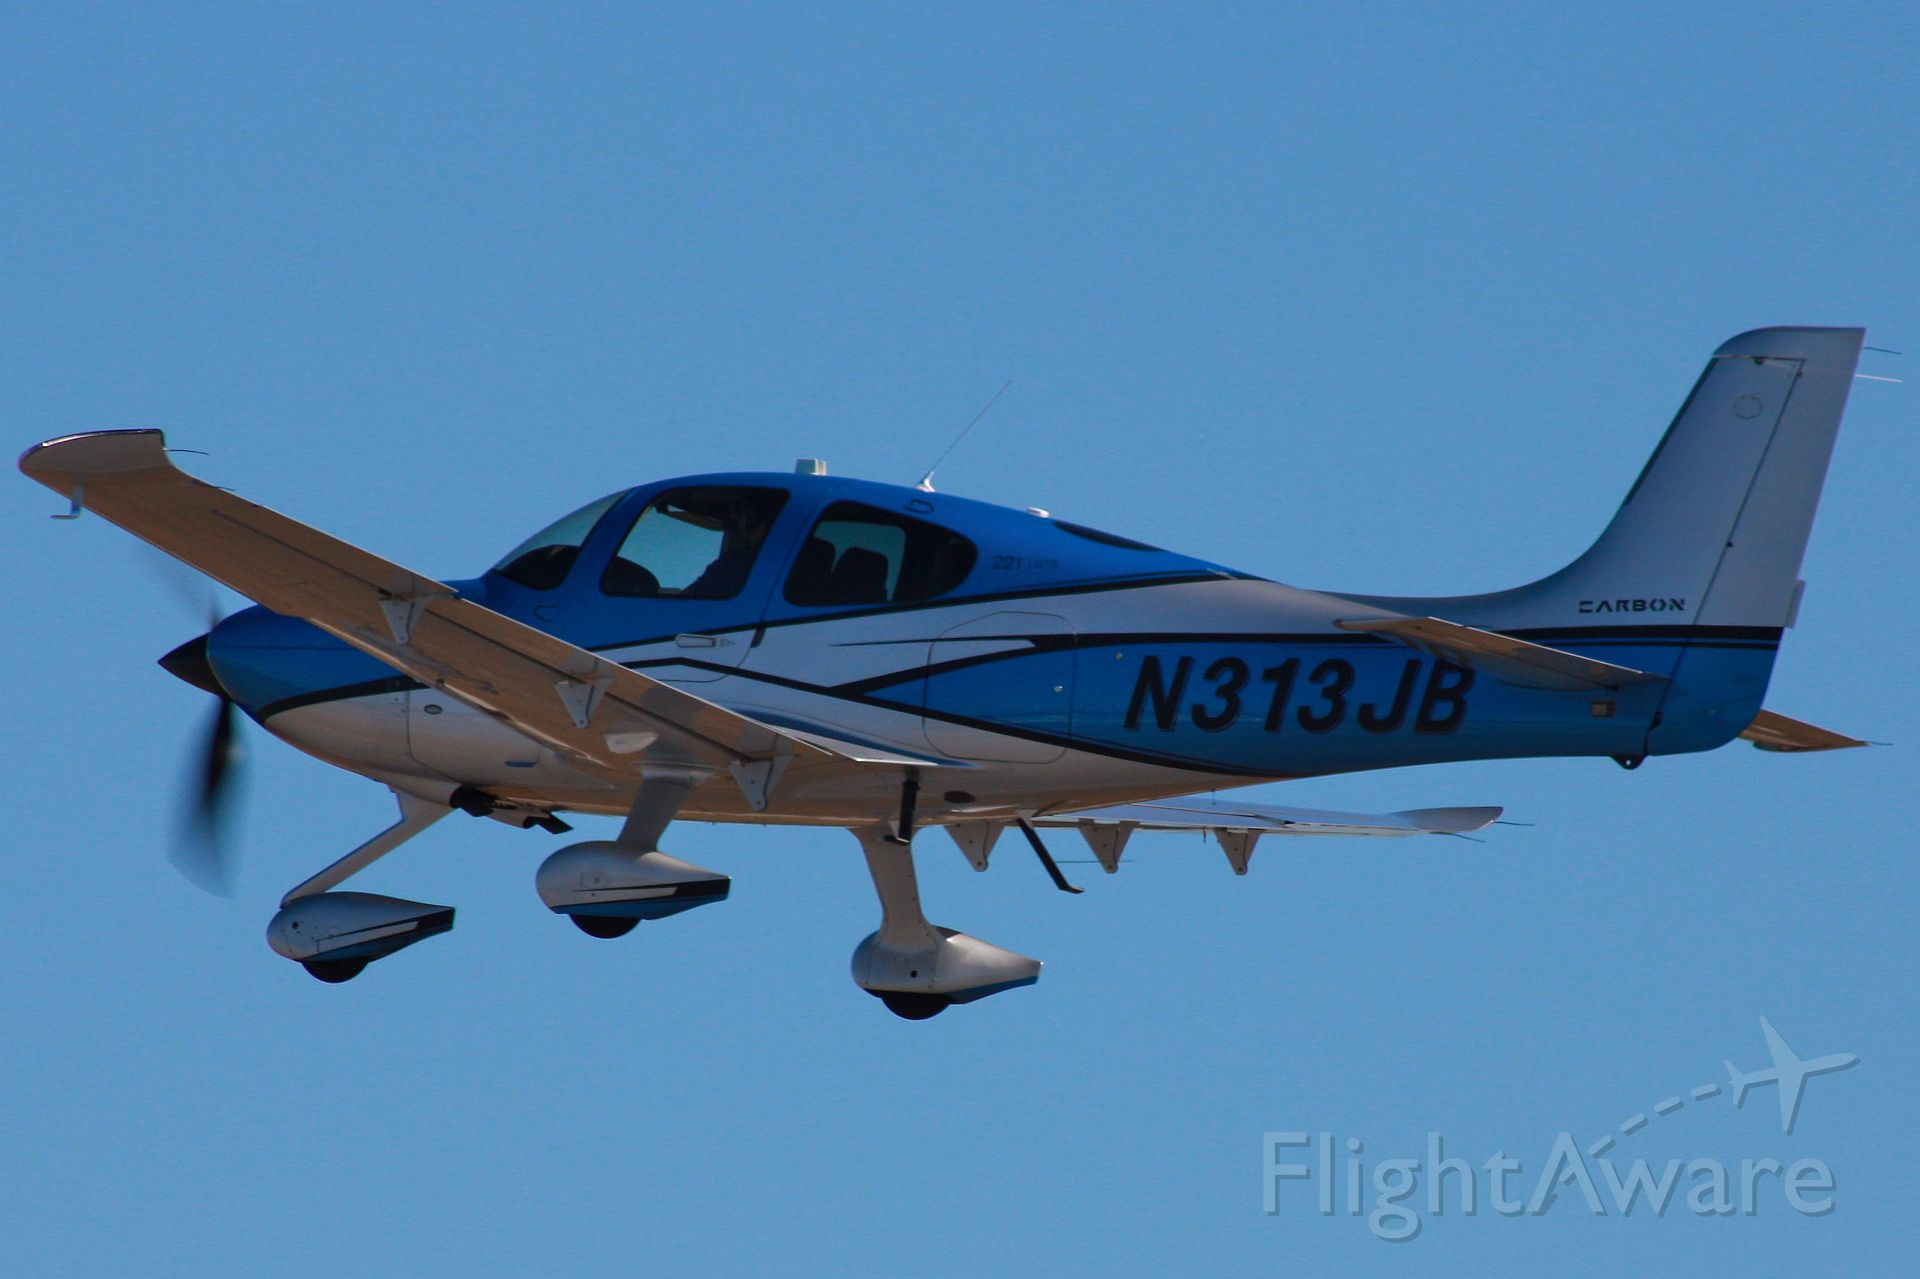 Cirrus SR22 Turbo (N313JB) - Photo taken on 11/18/2020.